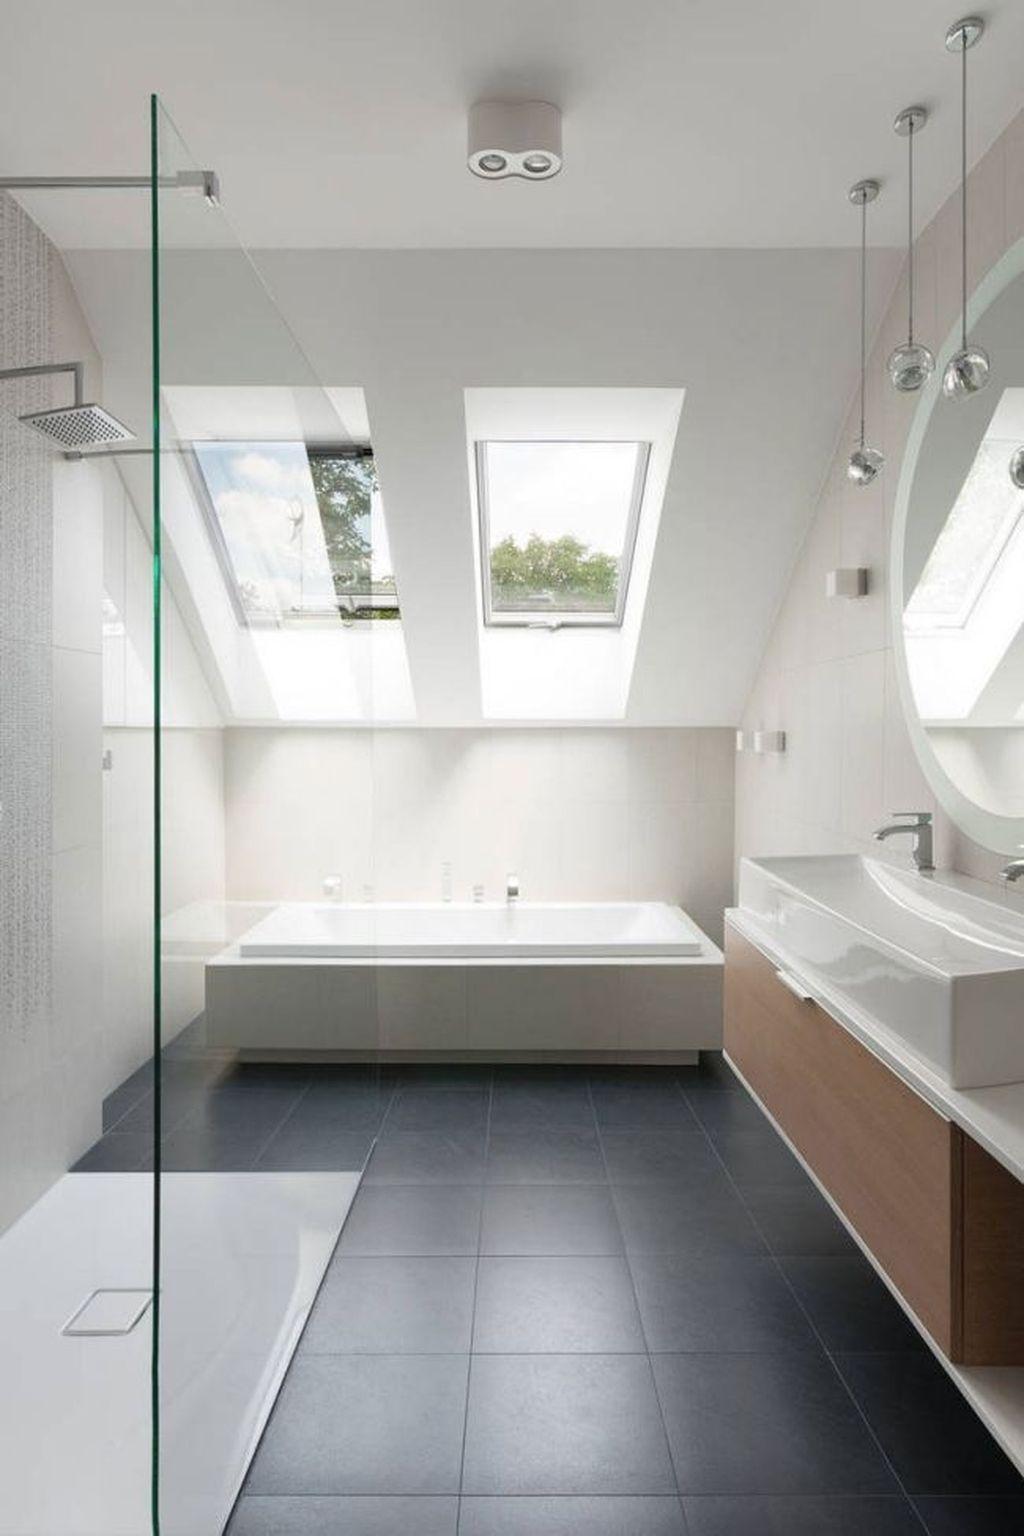 Fabulous Minimalist Bathroom Decor Ideas That Become Everyones Dream 11